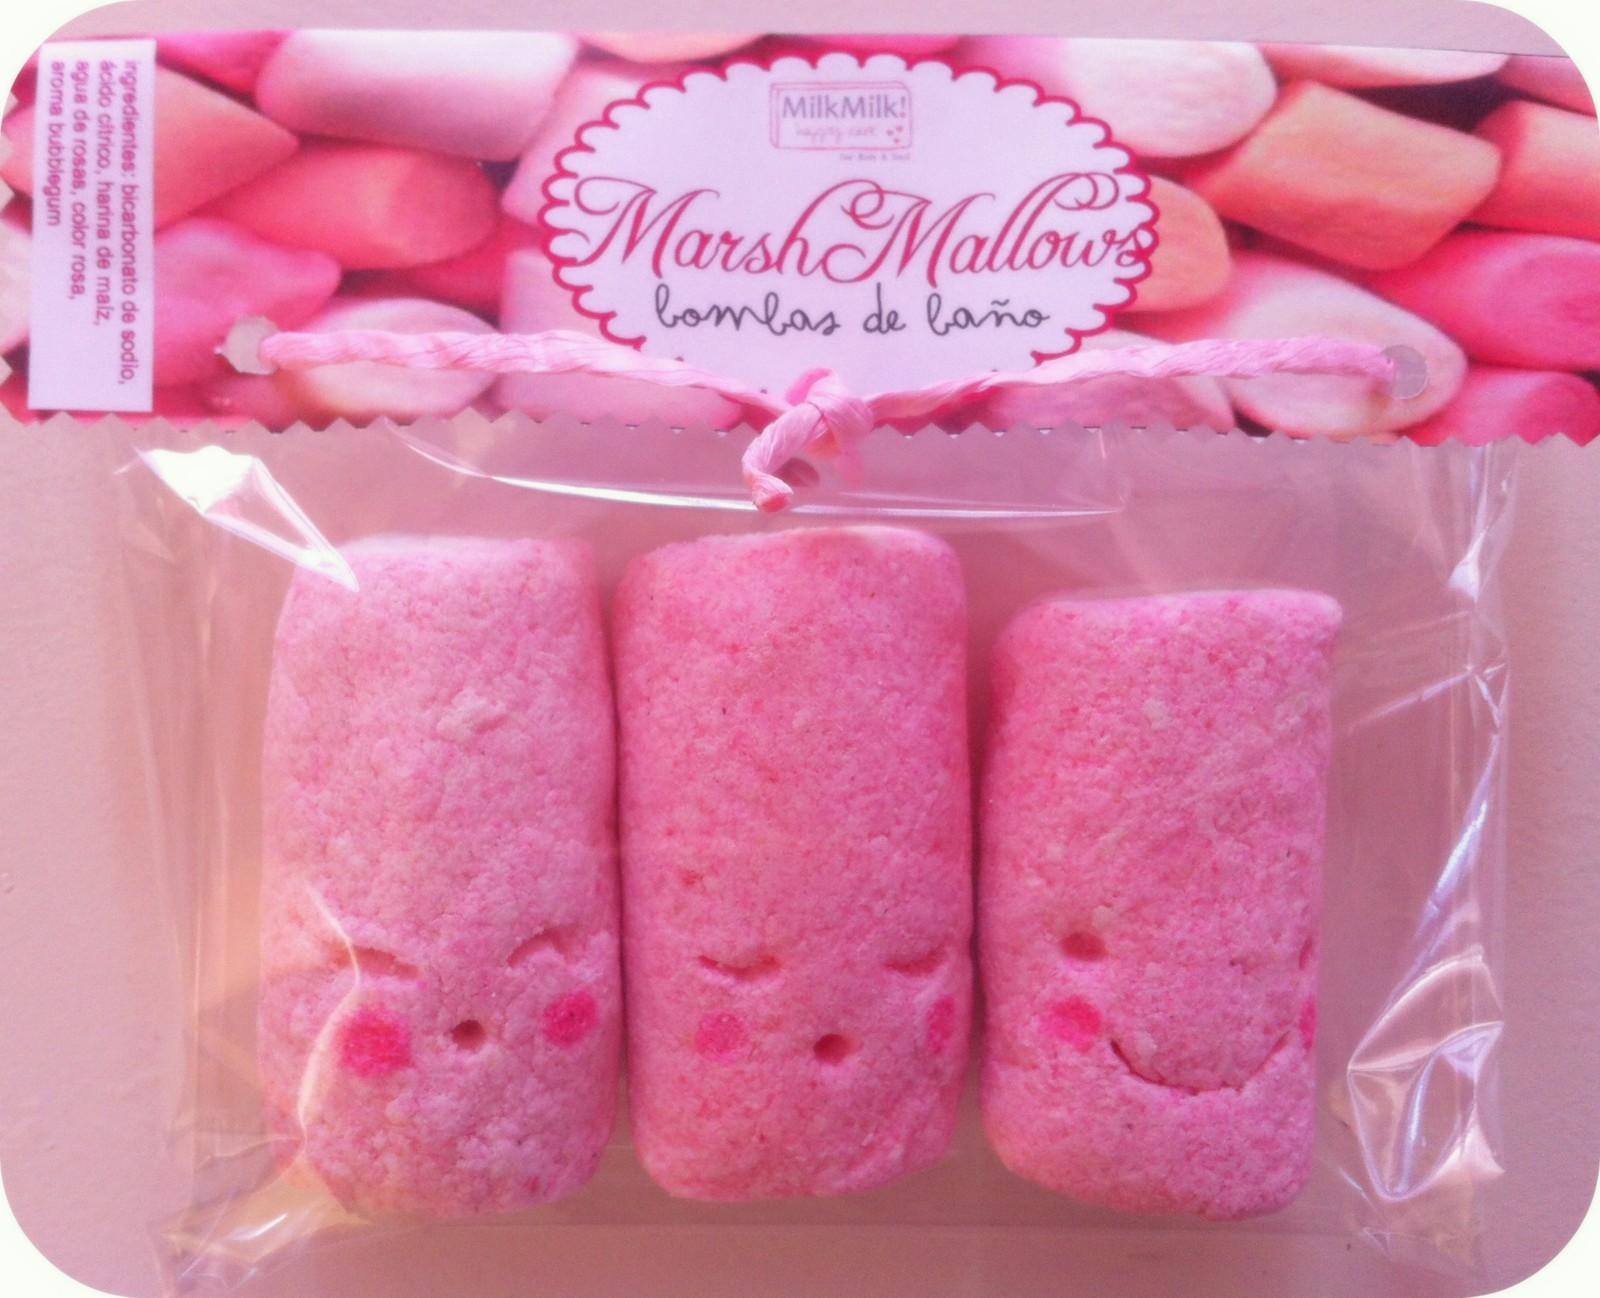 Milkmilk happysoaps bombas de ba o marshmallows - Bombas de bano lush ...